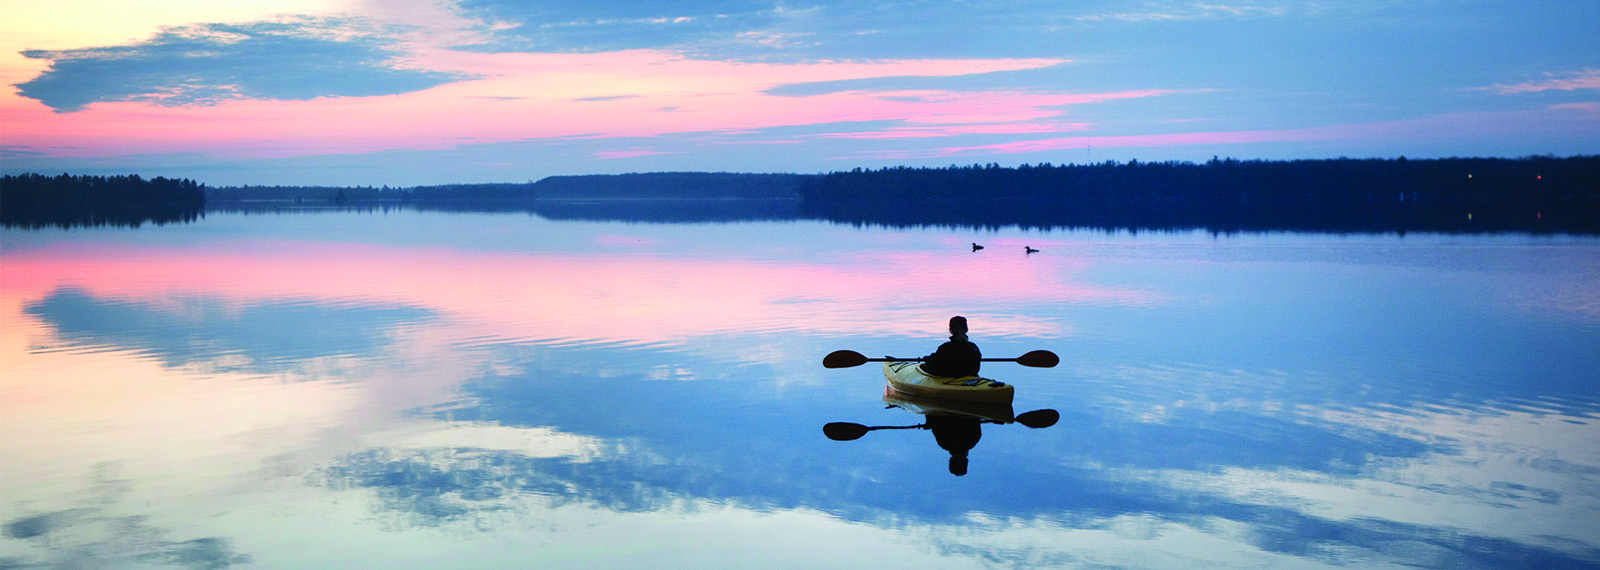 City of kawartha lakes tenders dating